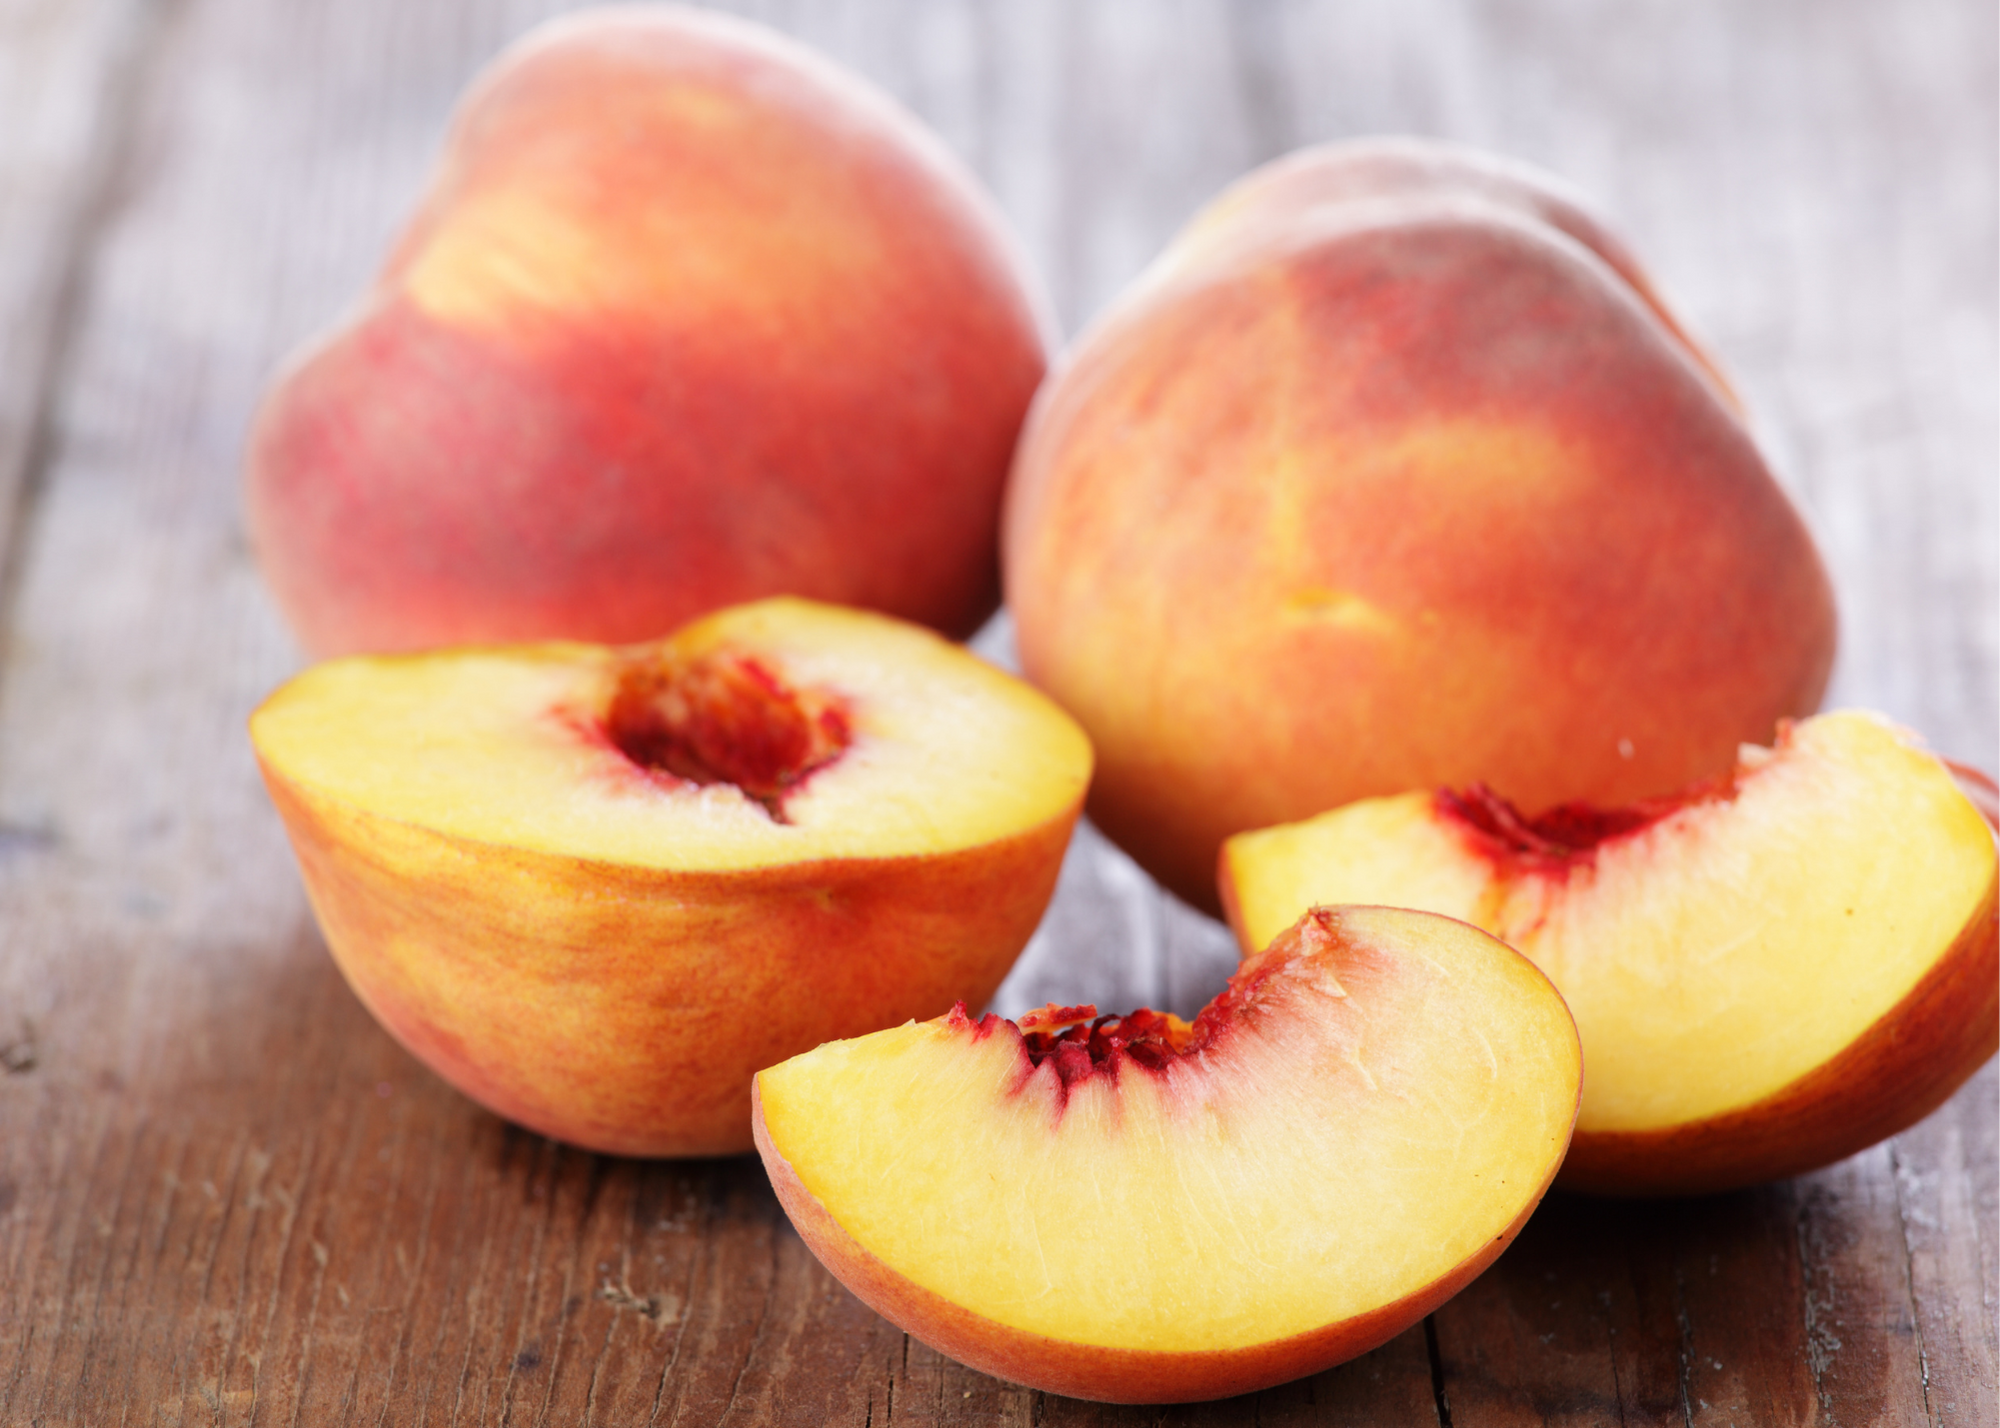 wood farmhouse table, peaches, peach slice, peach halves fresh fruit peaches